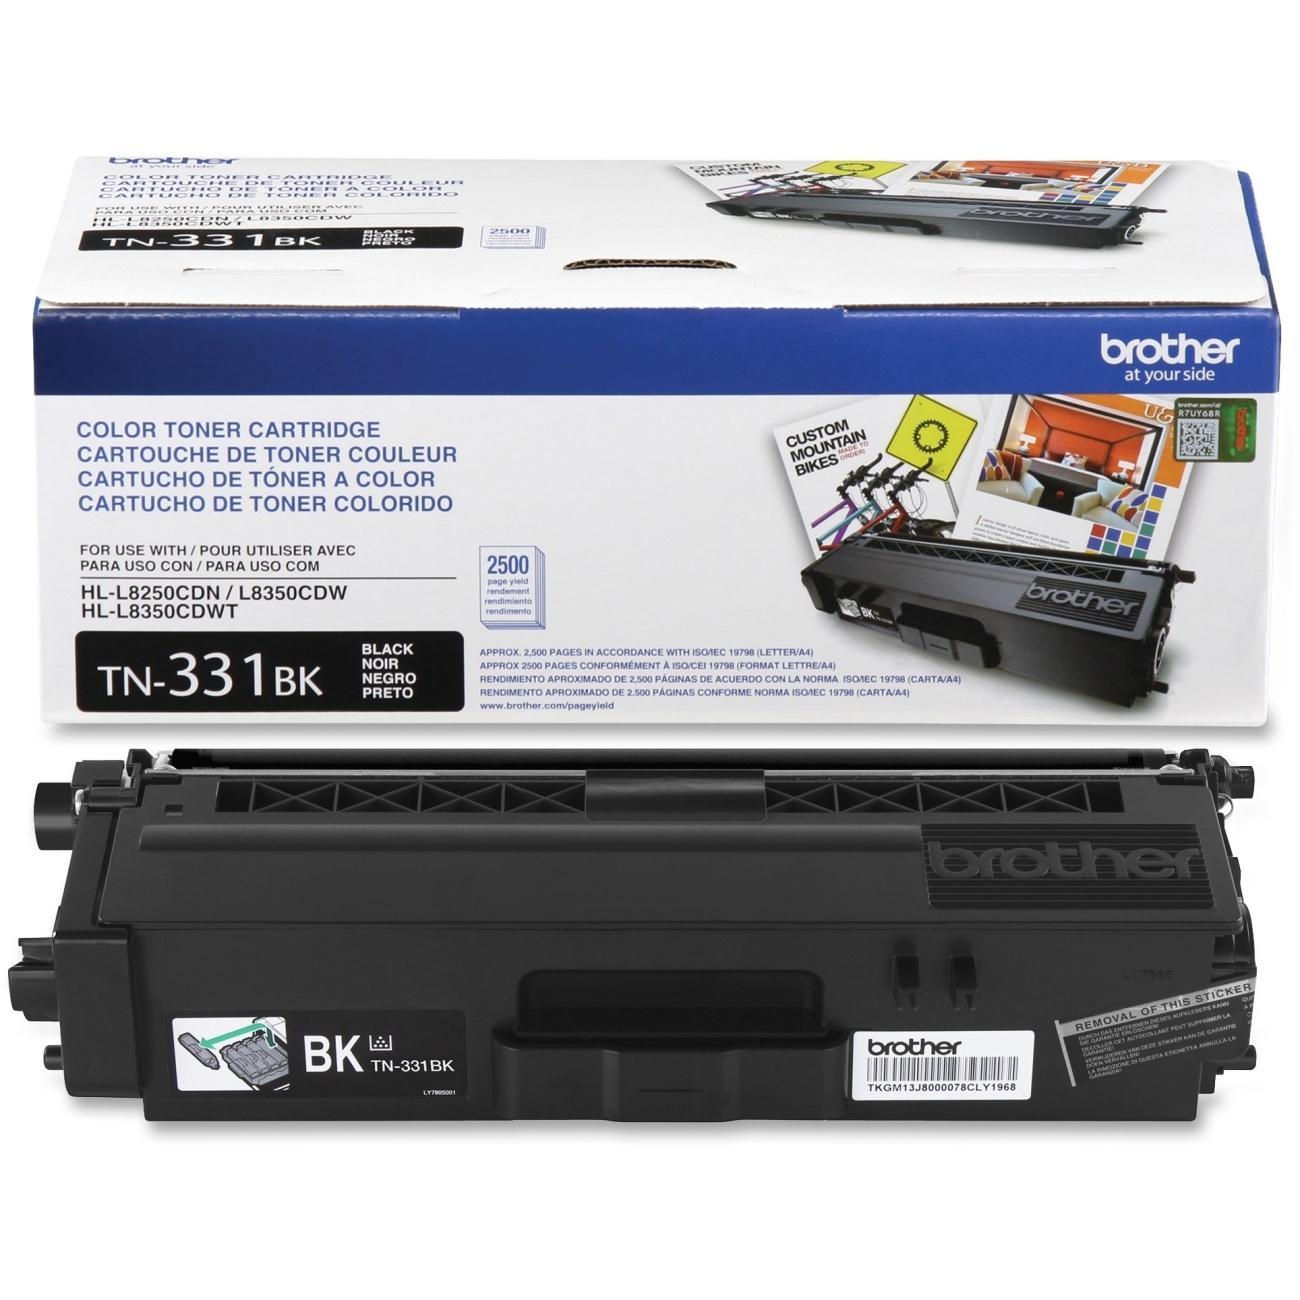 Tn 331 336 Toner Reset Instruction 123inkca Canada Tinta Hp 46 Black Colour Original Brother Tn331bk Cartridge